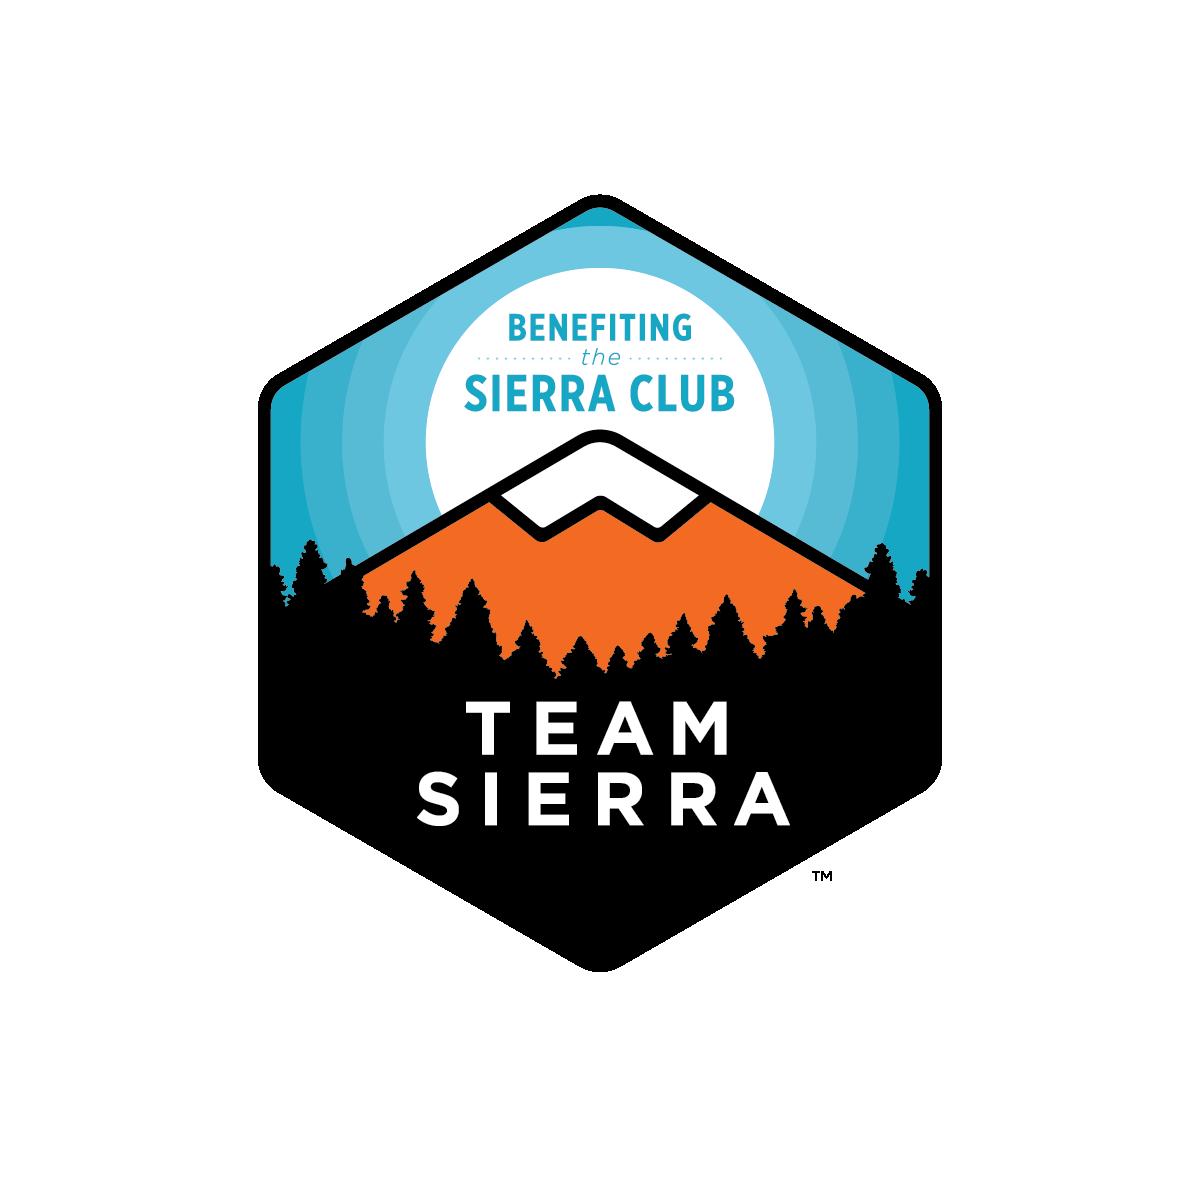 Sierra club logo clipart banner transparent download Style Guide - Team Sierra banner transparent download